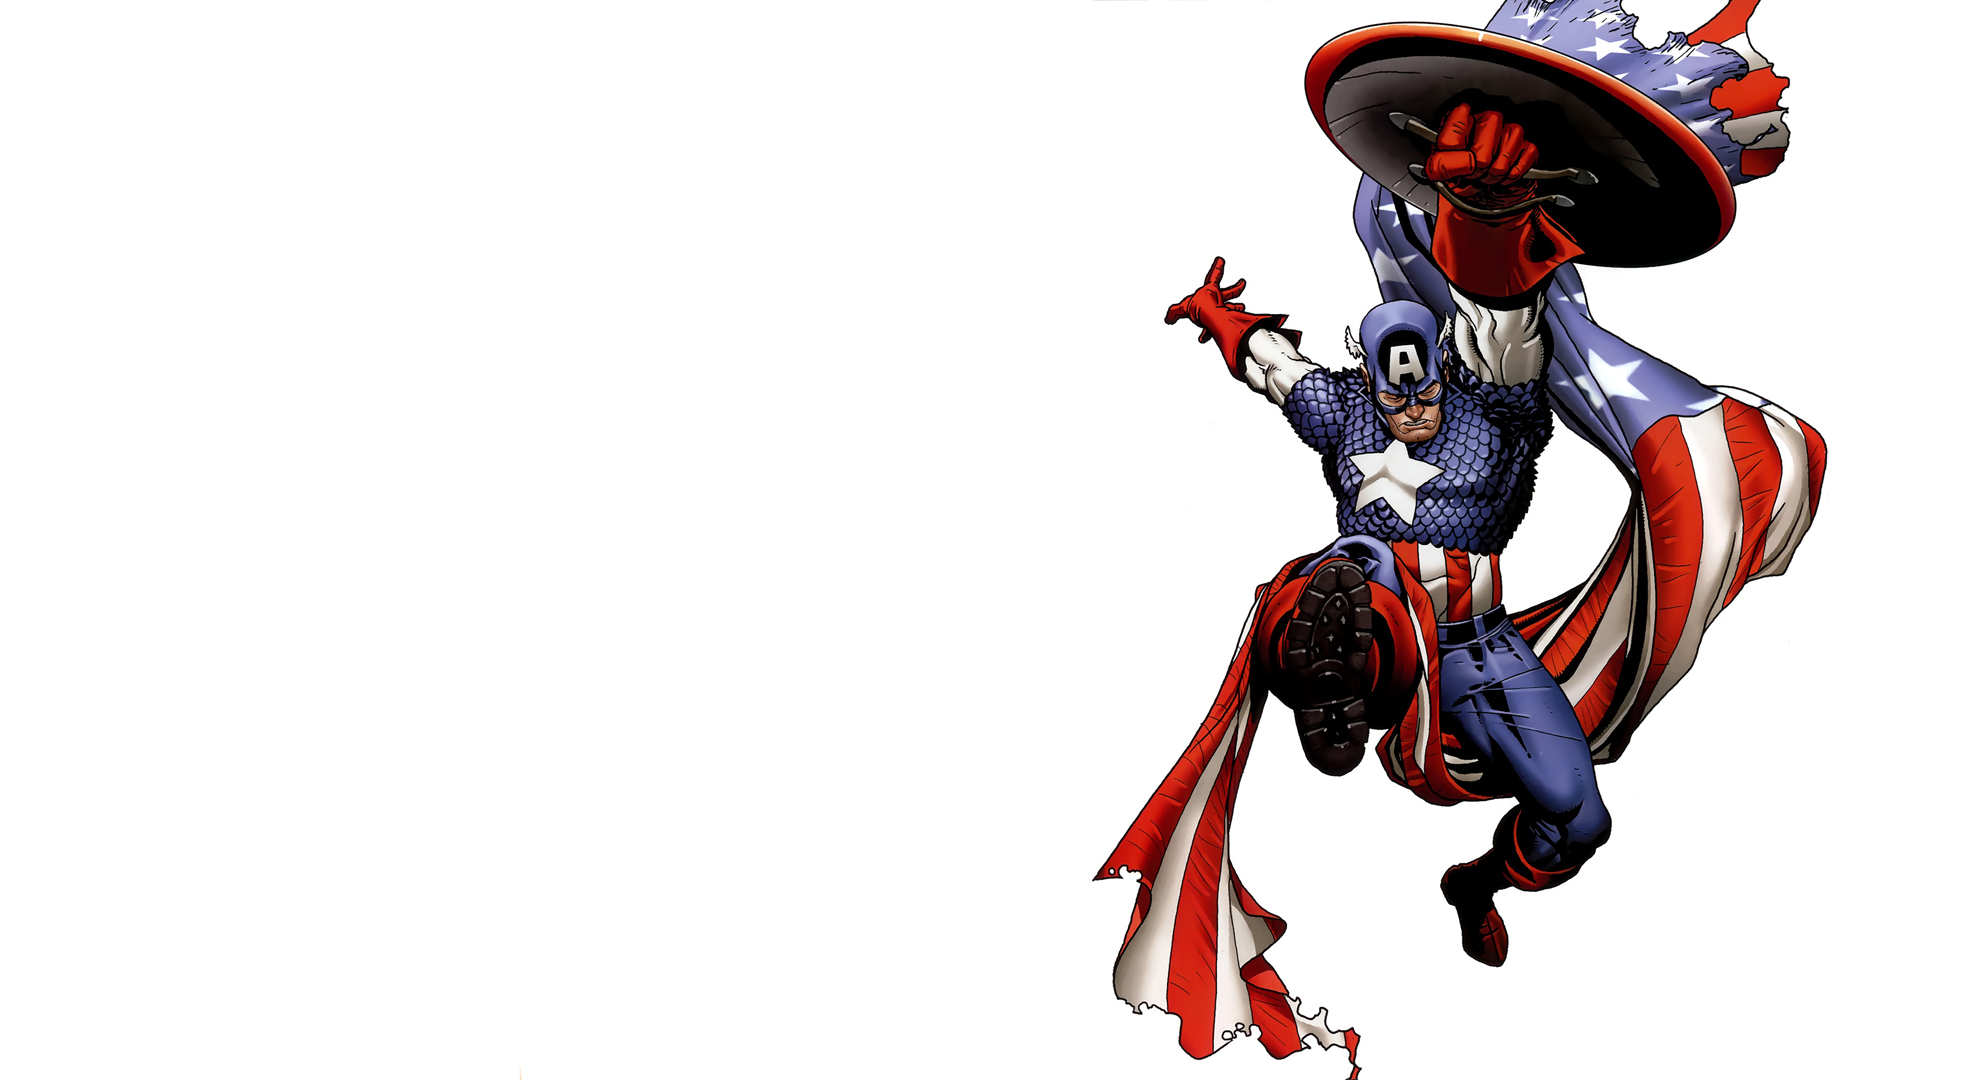 Ausmalbilder Marvel Helden Angel: Hintergrundbilder Comic-Helden Captain America Held Fantasy